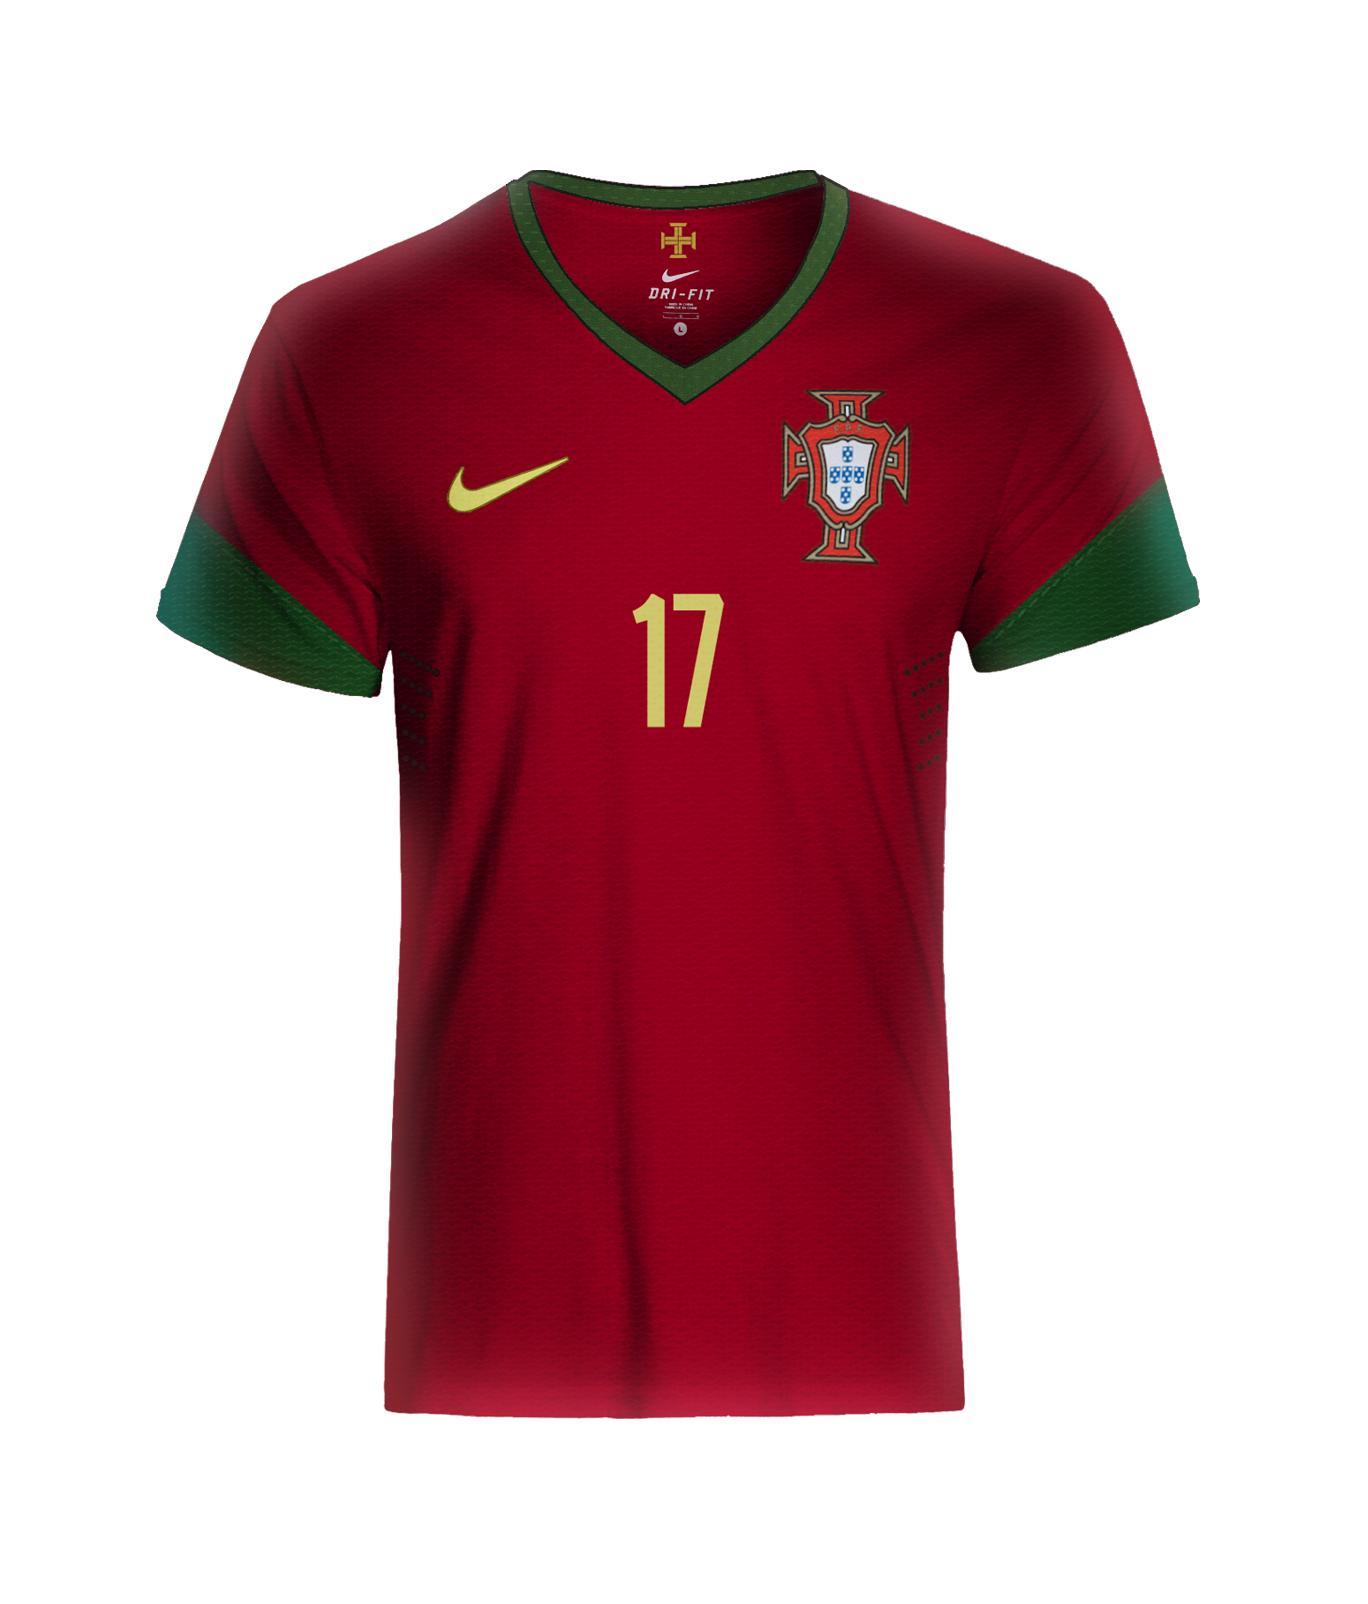 Nike Portugal 2014 Kit Skillshare Student Project